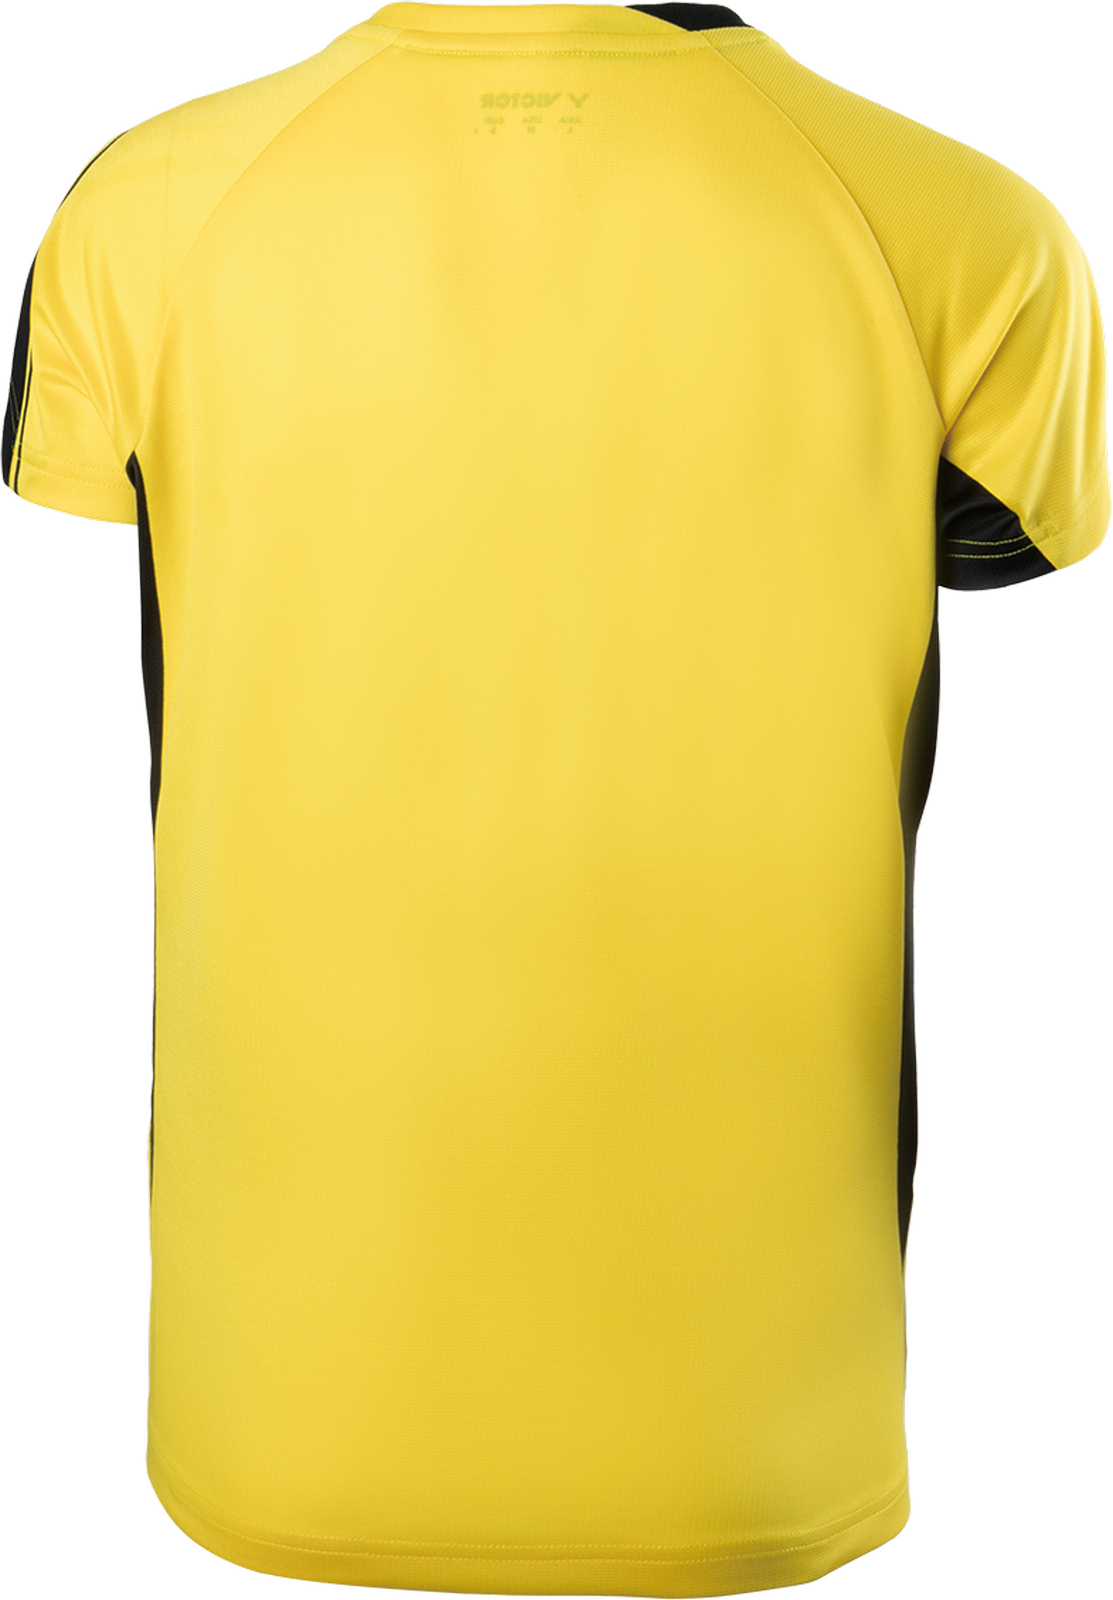 Victor Shirt Games Unixex gelb